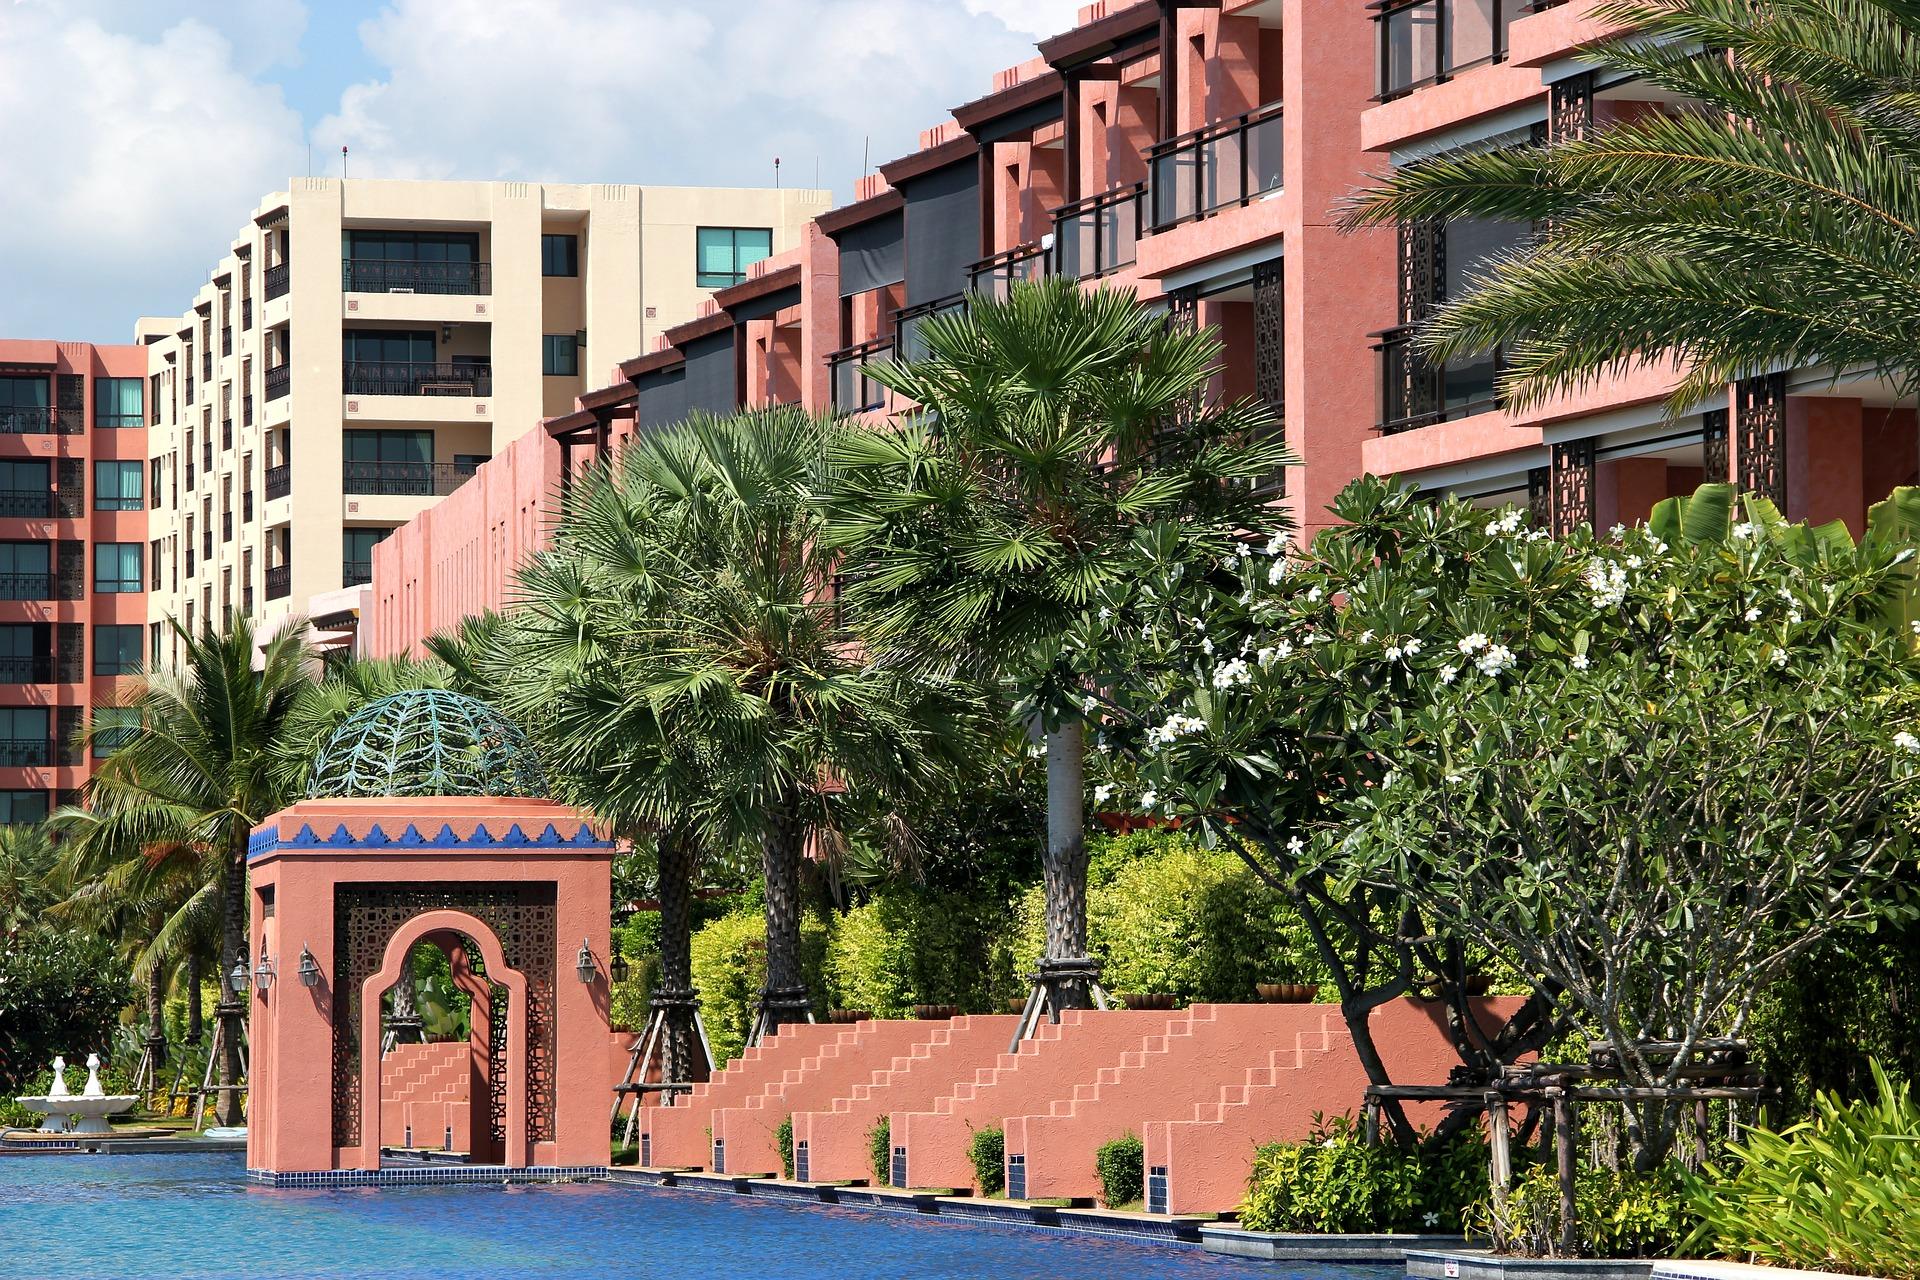 maroko, afrika, hotel, smeštaj, apartman